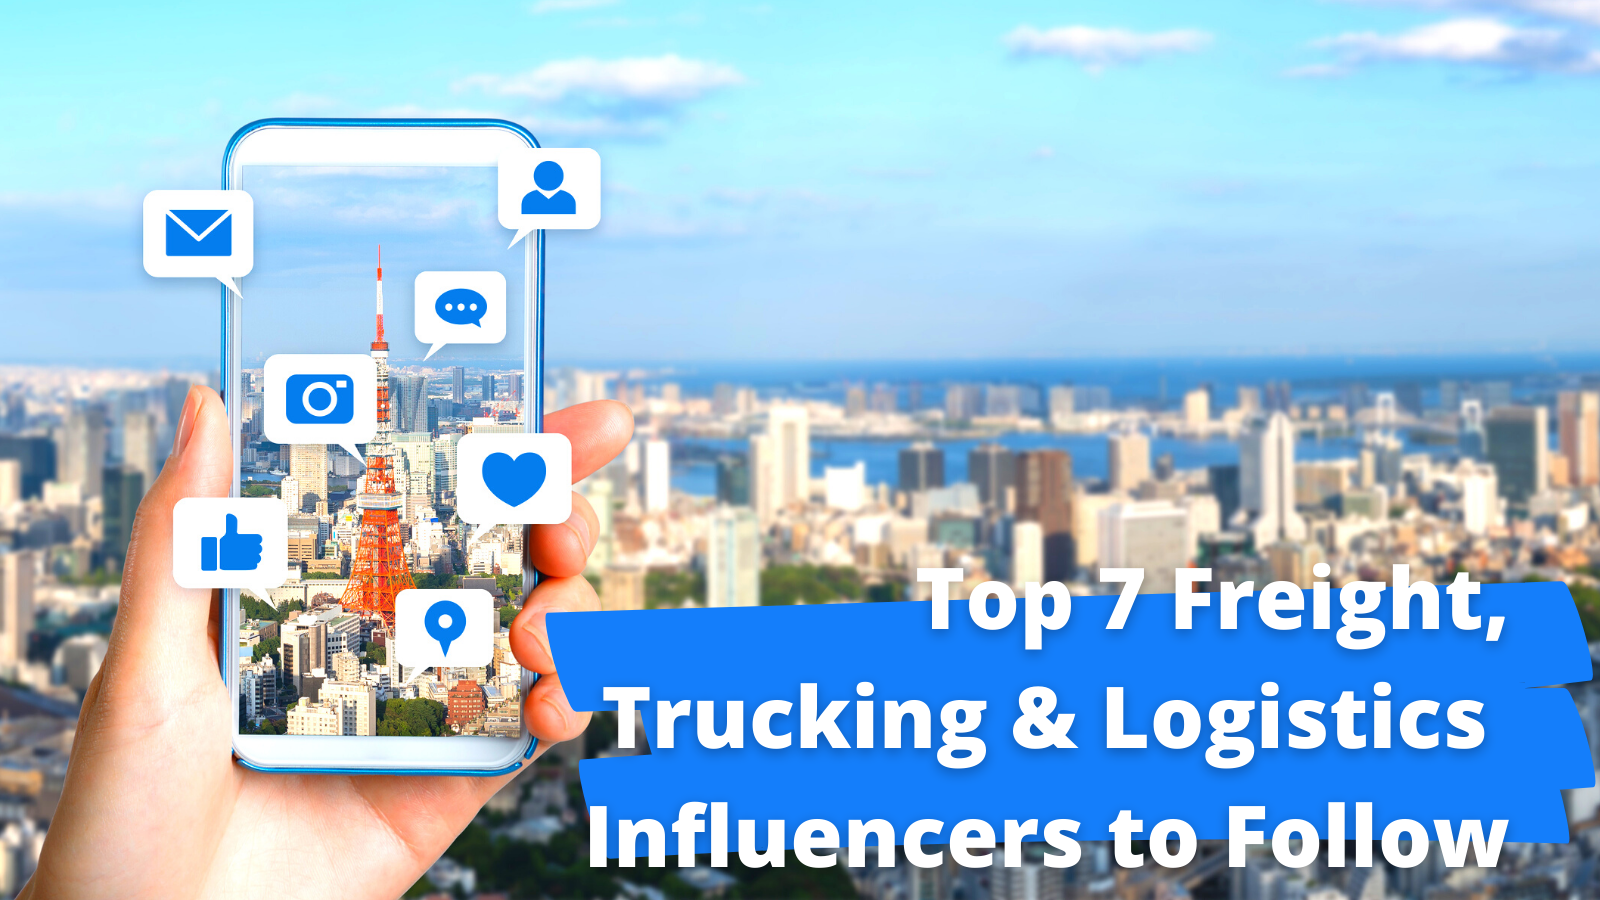 Top 7 Freight, Trucking & Logistics Influencers to Follow